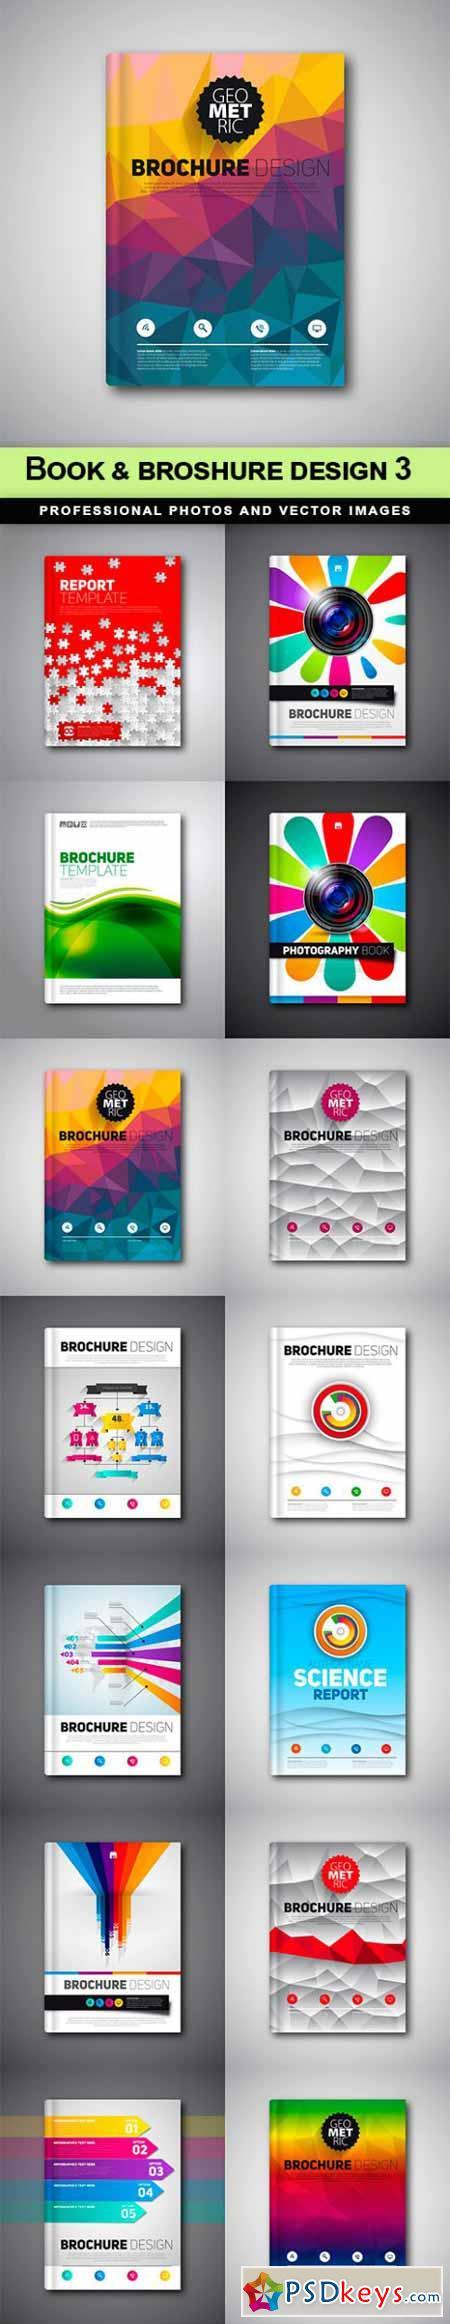 Book & broshure design 3 - 14 EPS